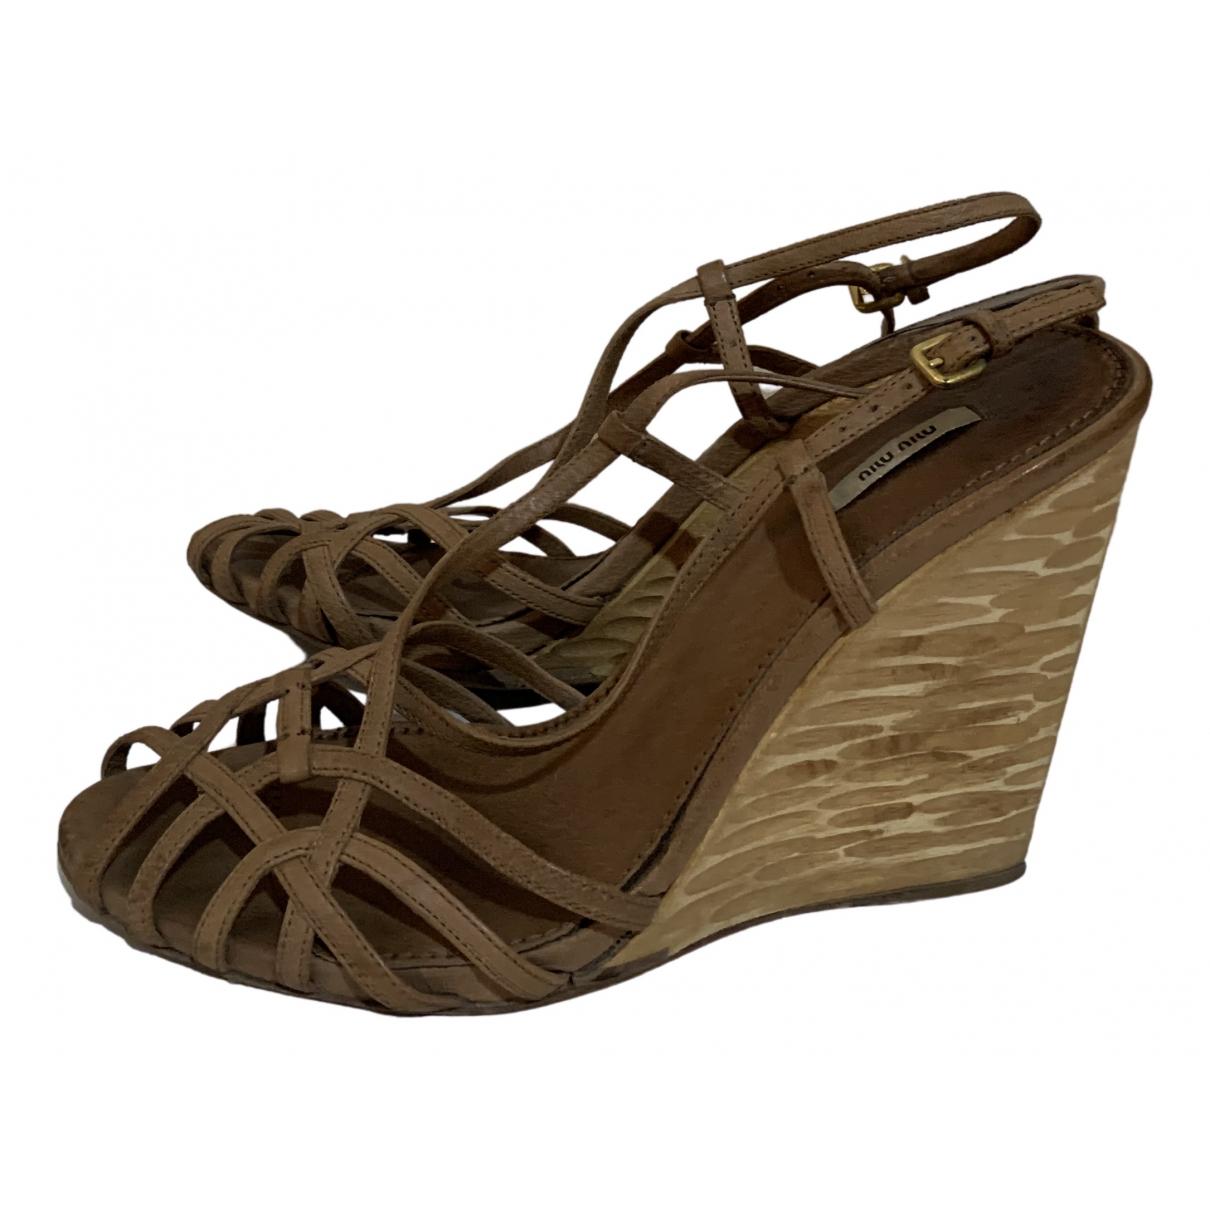 Sandalias de Cuero Miu Miu